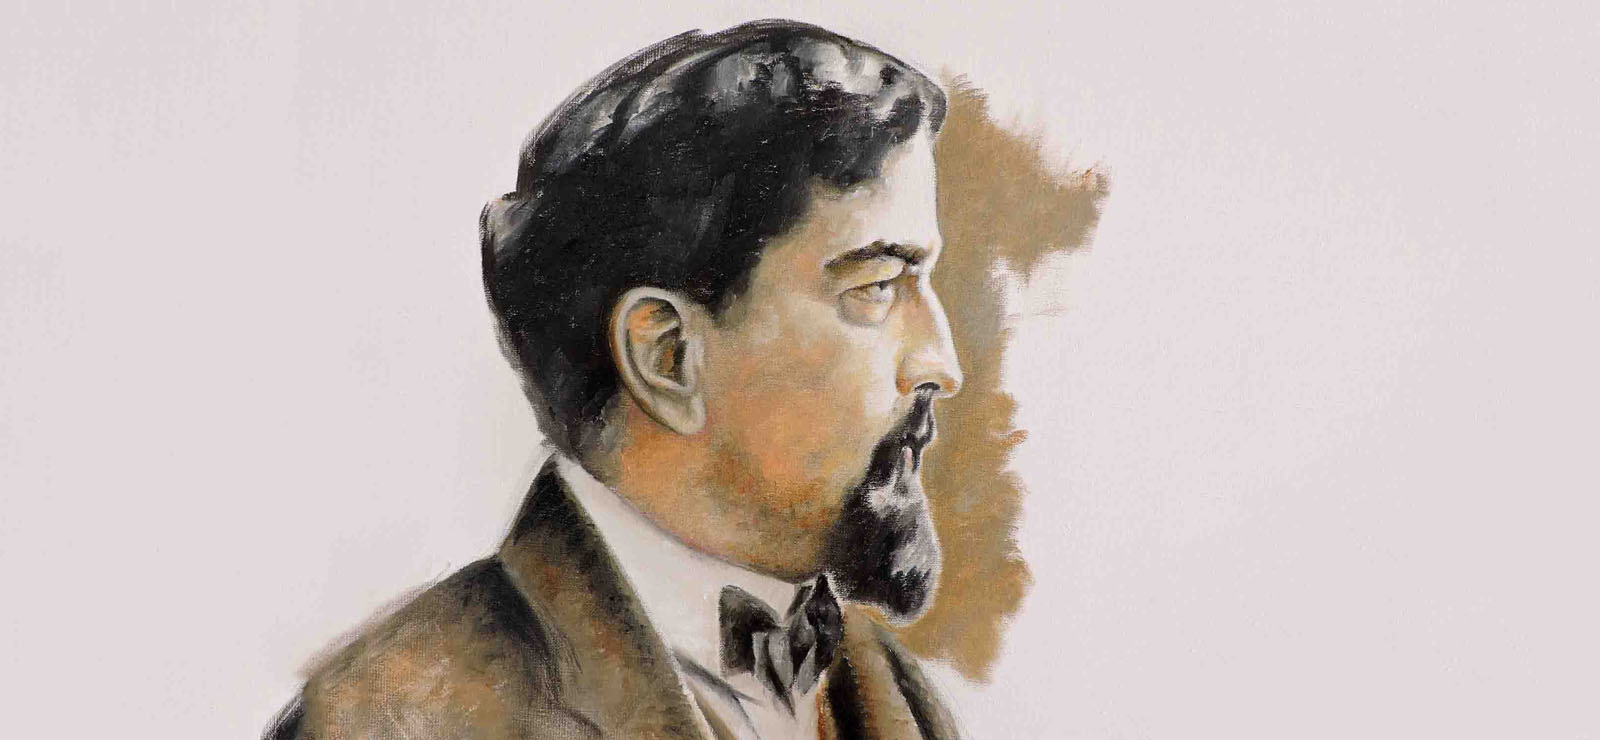 [Program Eleven:The Spectacular Legacy of Rimsky-Korsakov] Claude Debussy by Donald Sheridan